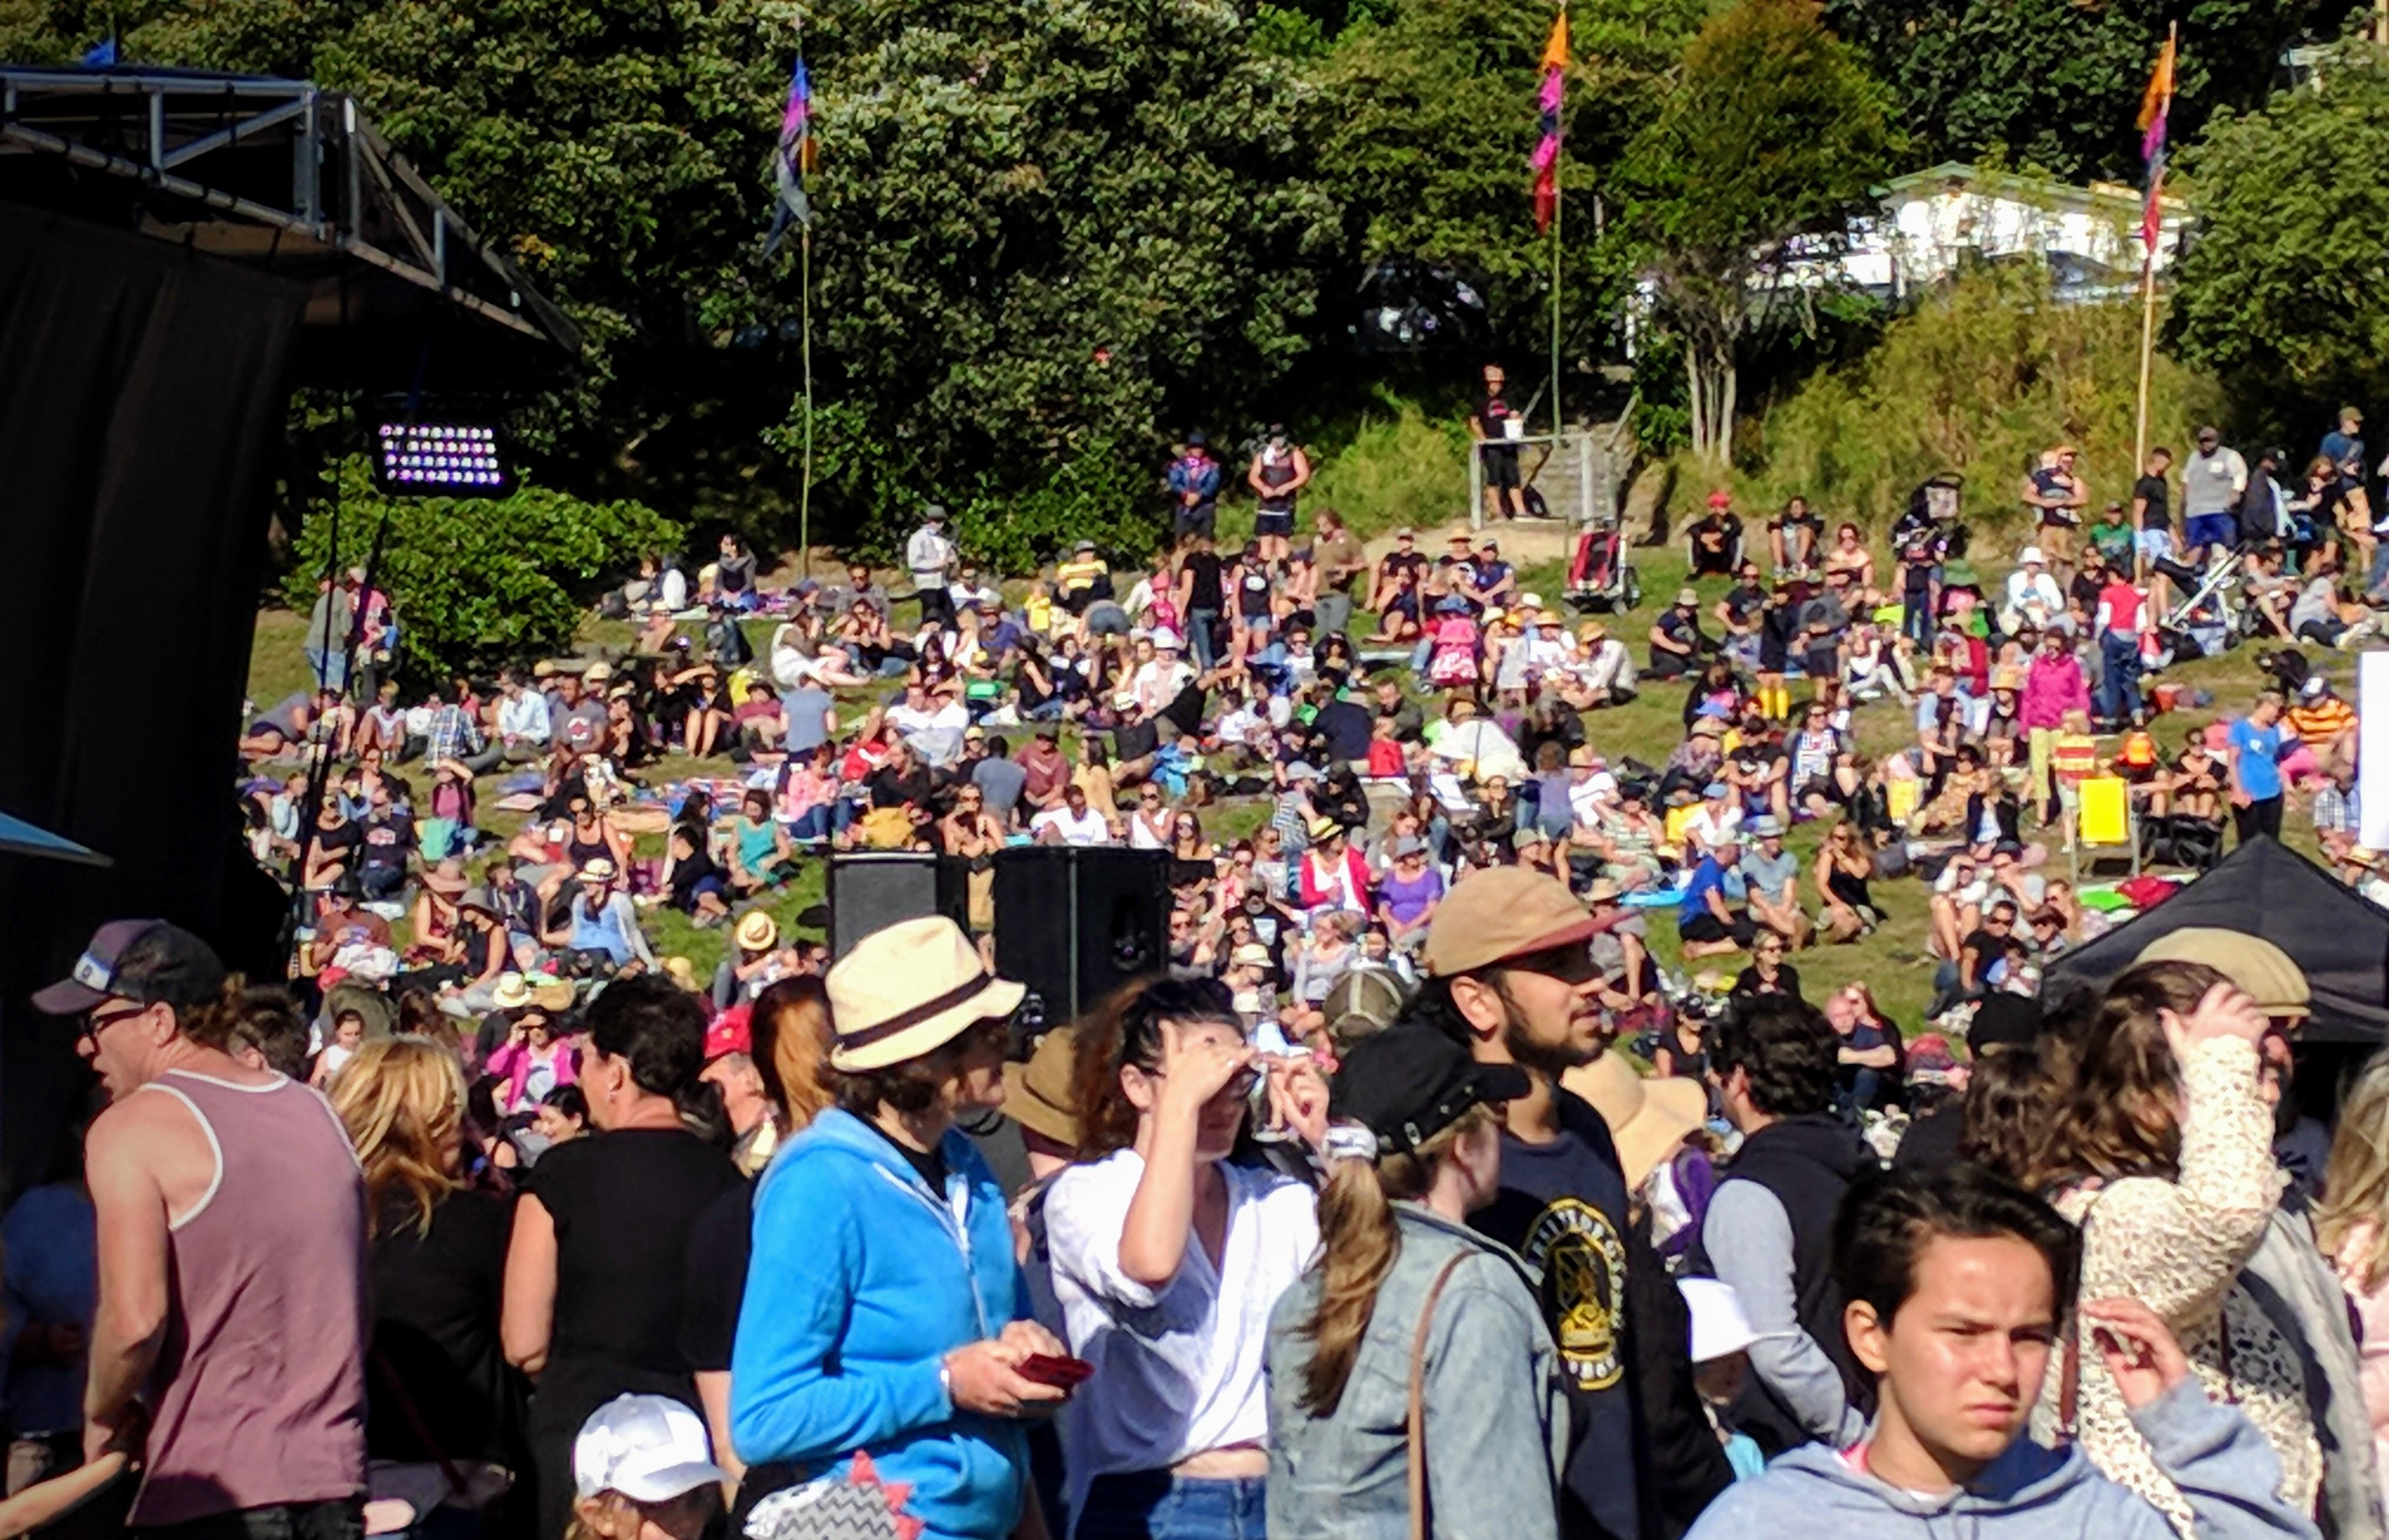 Crowds at Kotahi 2018 (Strathmore Park, Wellington)